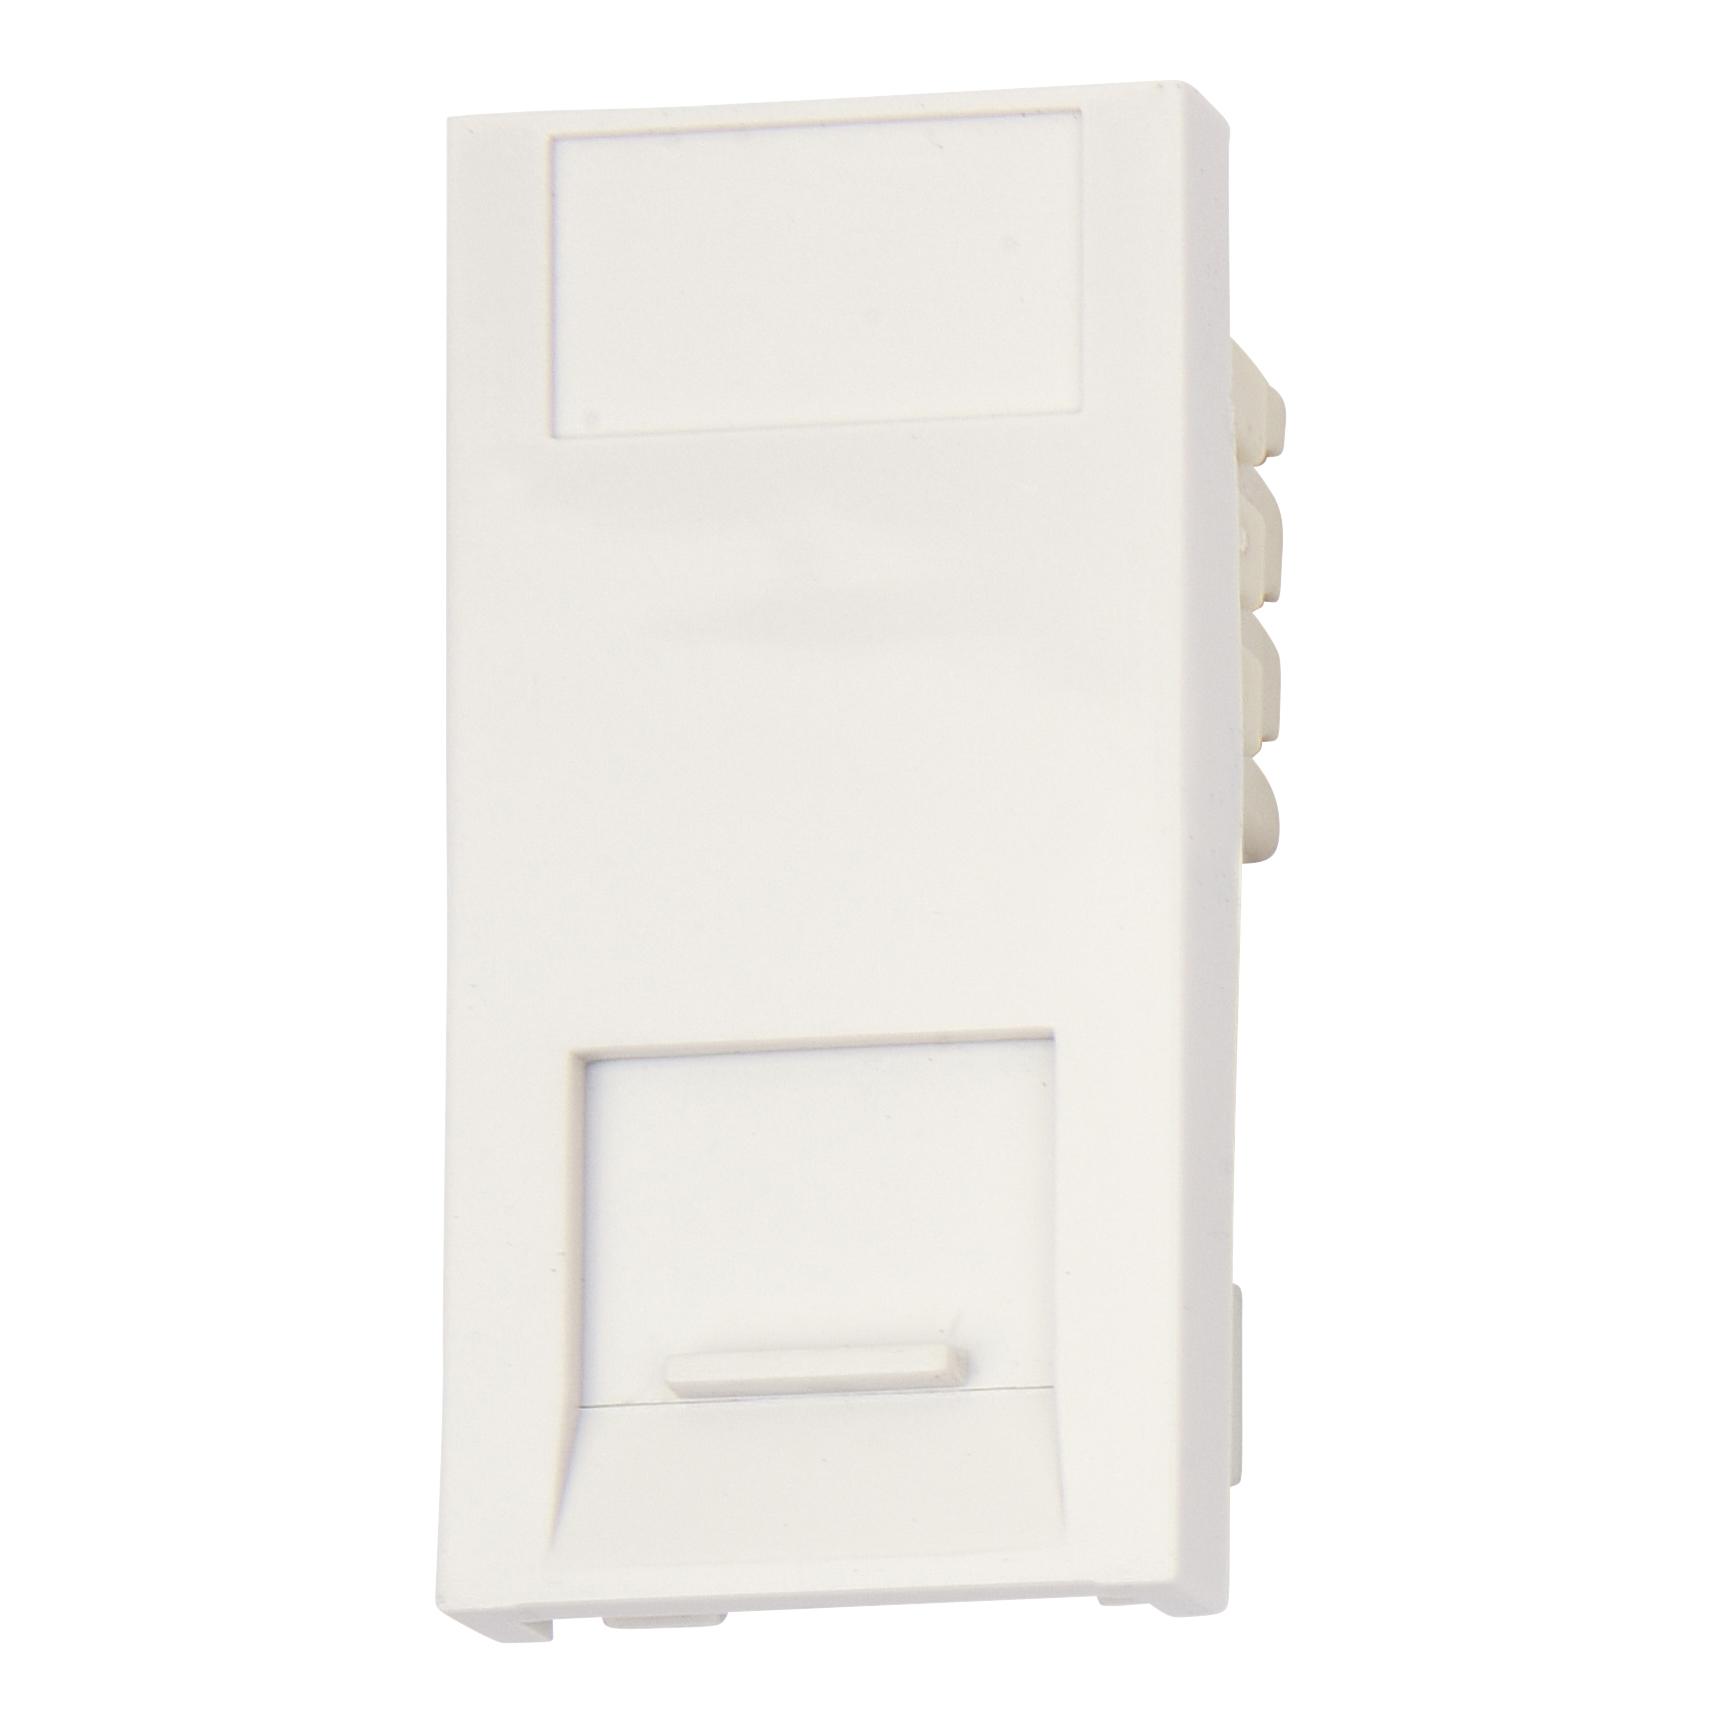 Deta RJ11 Secondary/Slave Telephone Module - White